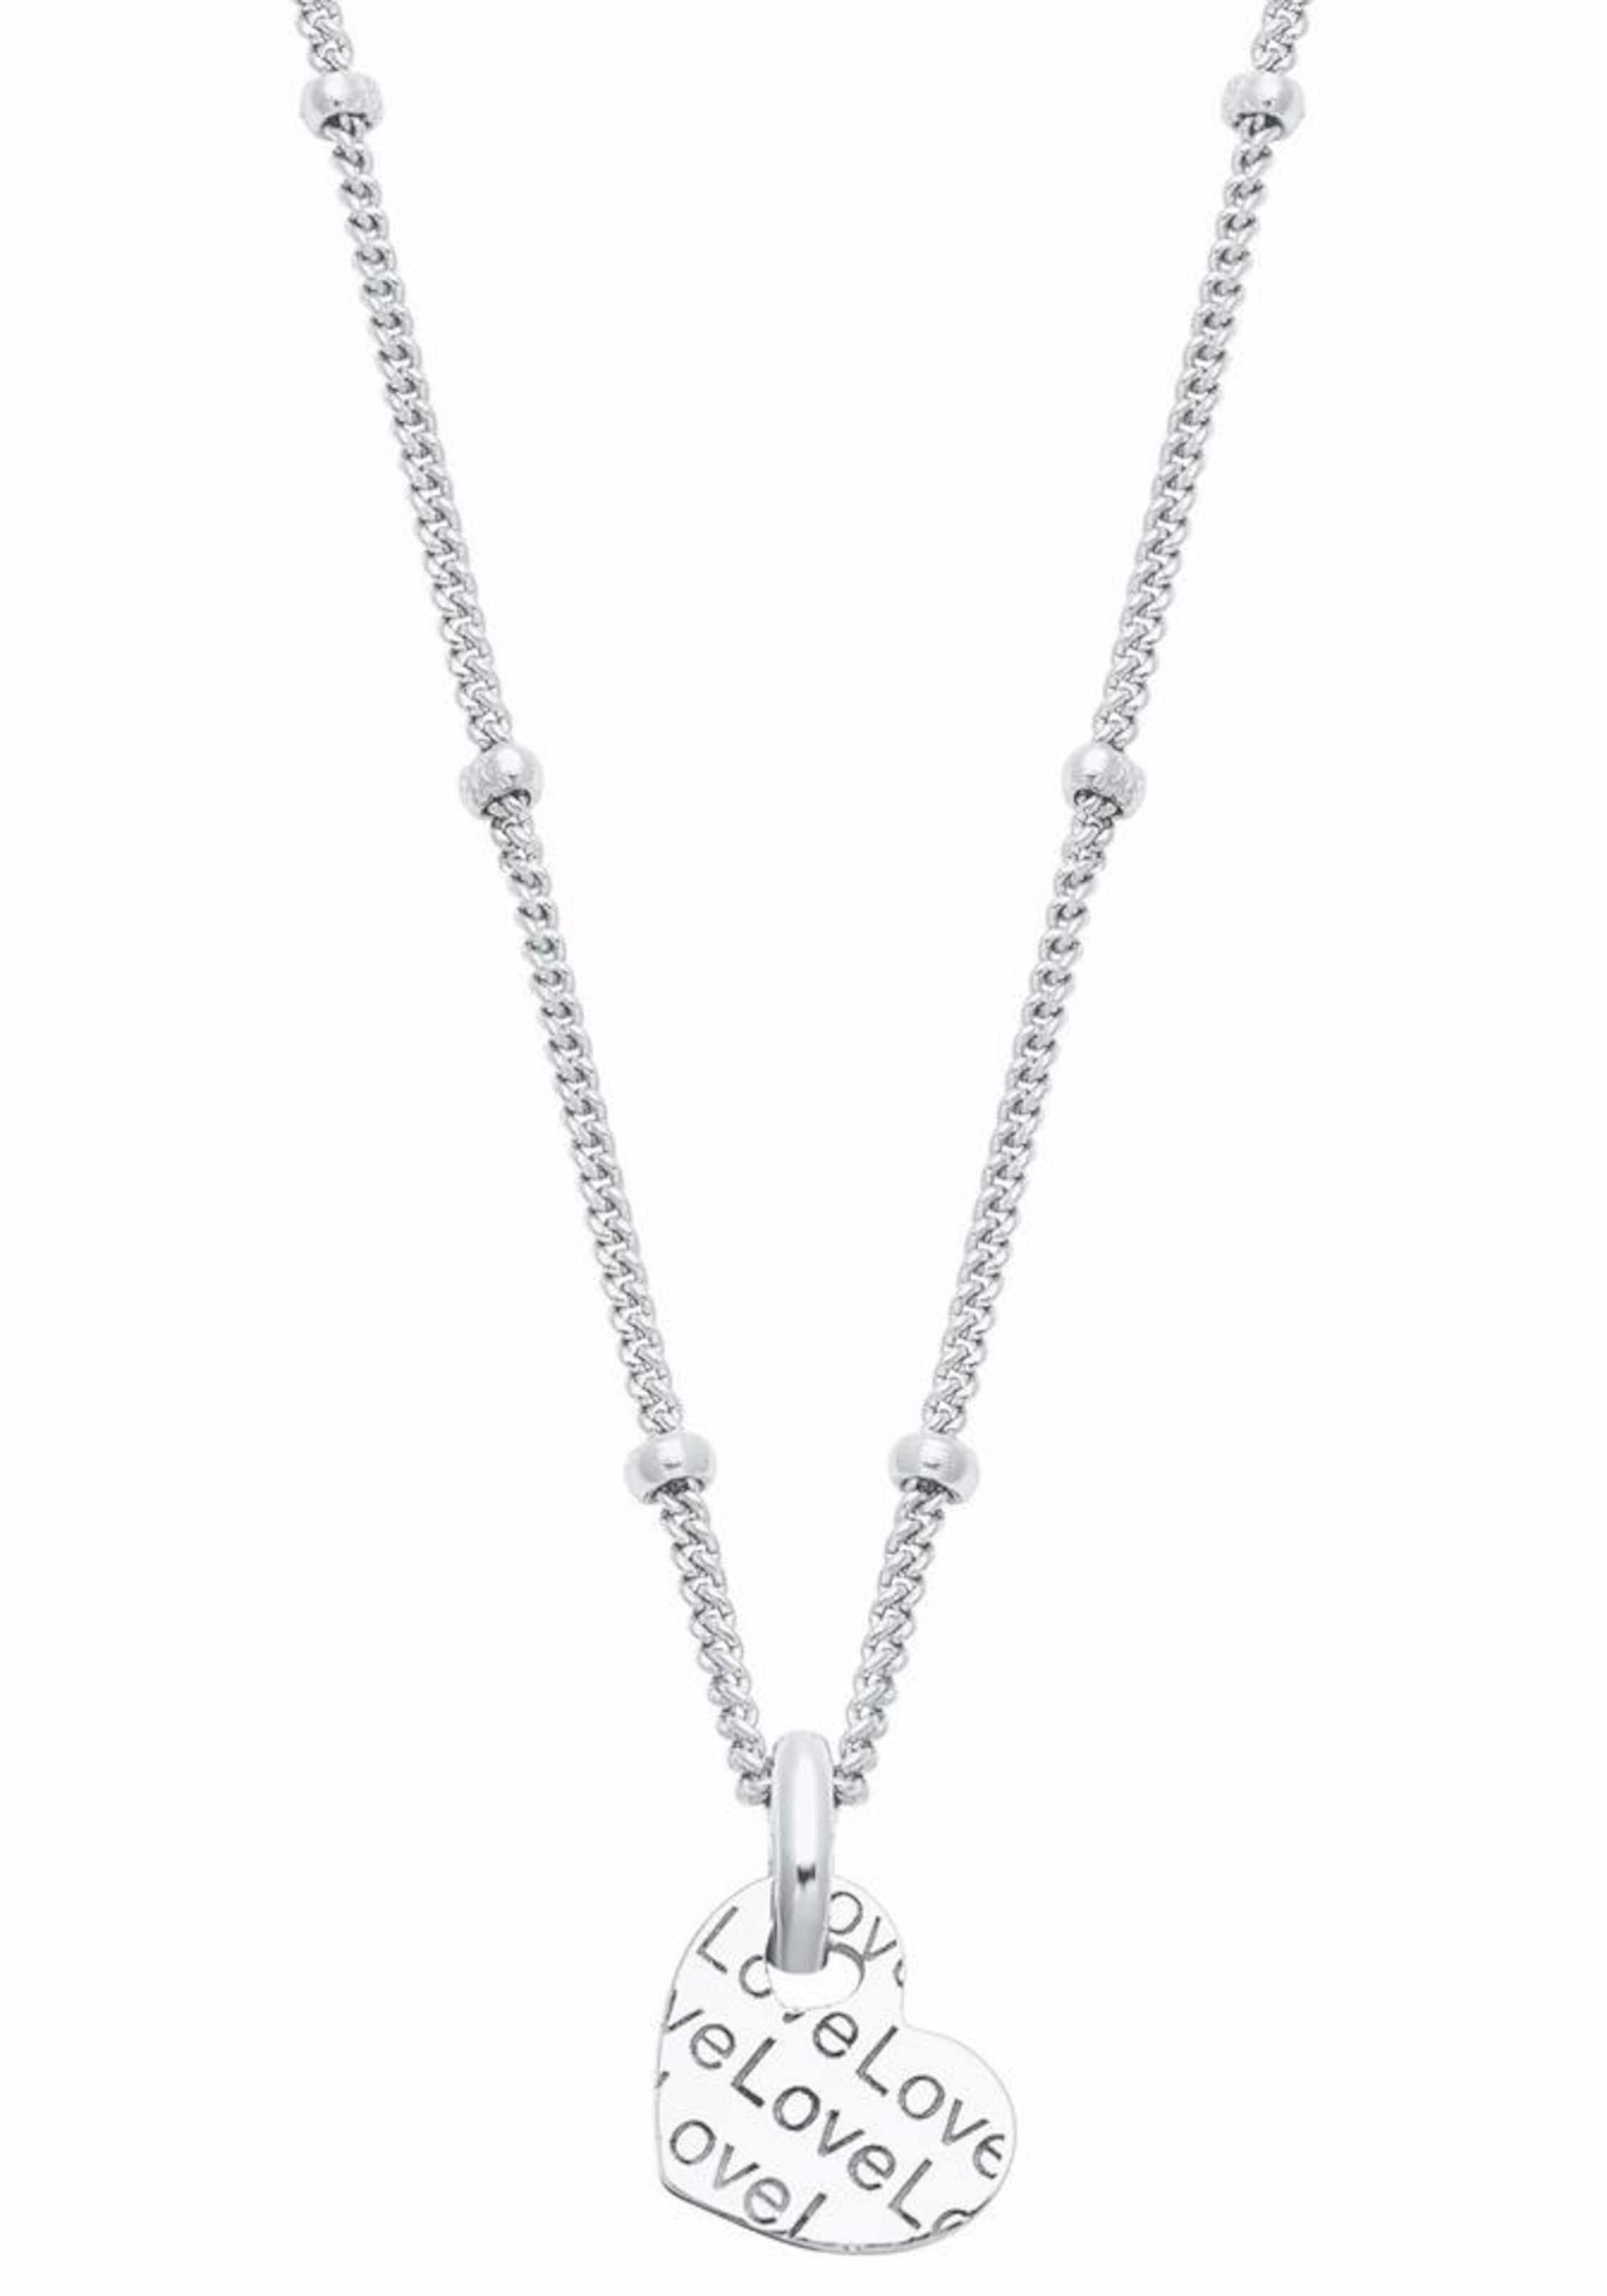 Silber Kette 'herz S love2024319' oliver In fy76Ygvb